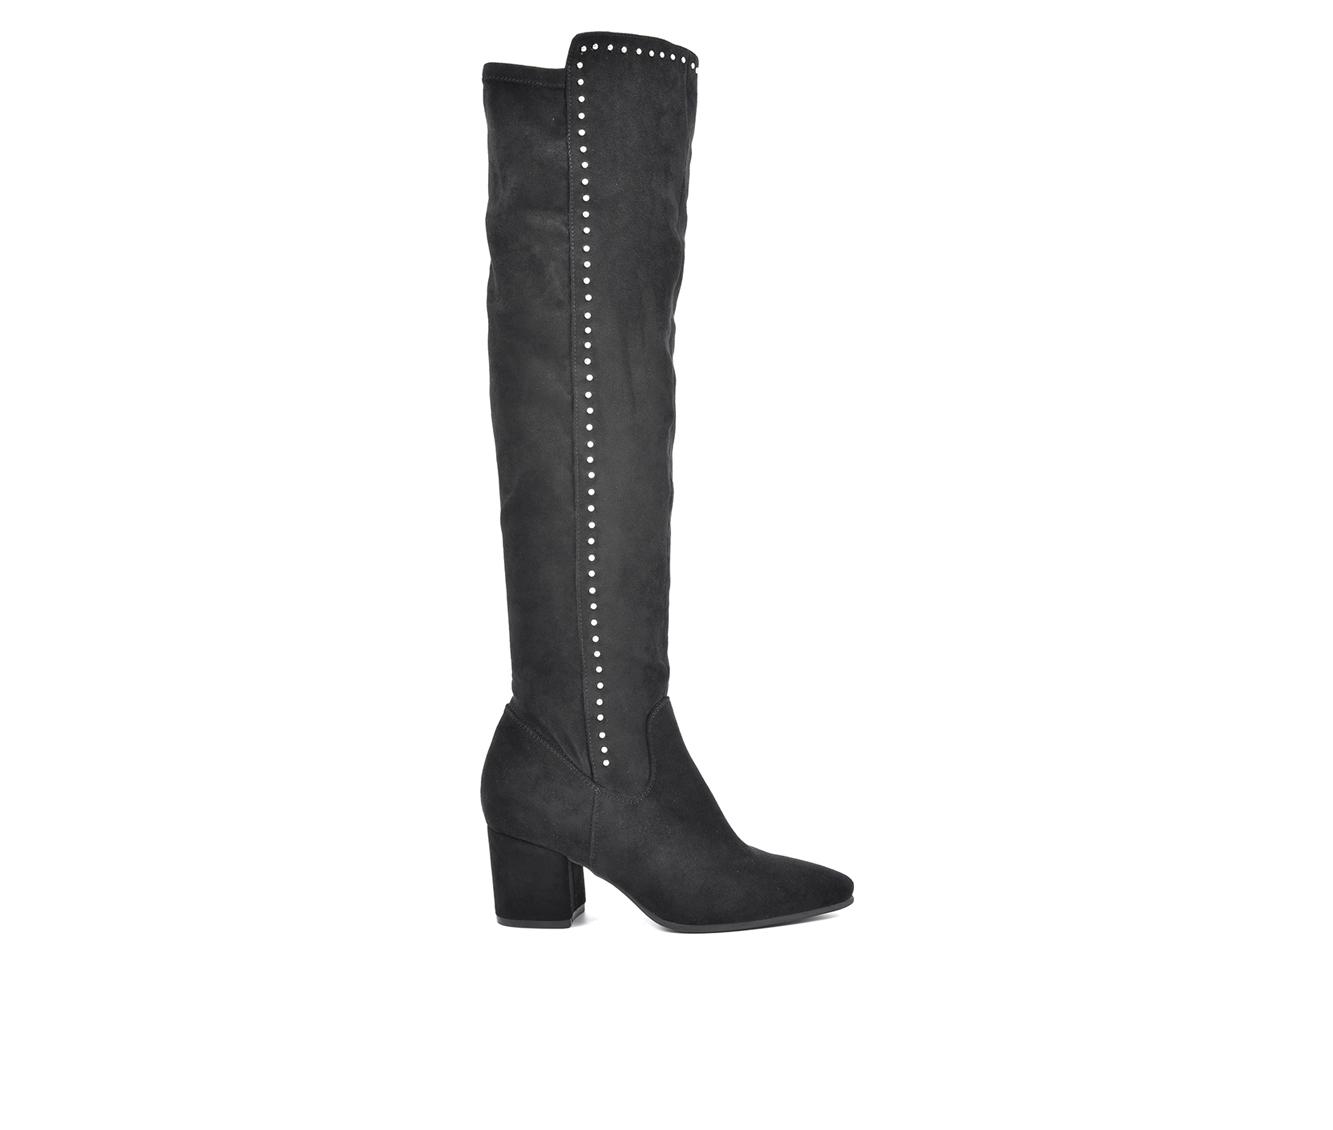 Seven Dials Nessie Women's Boots (Black - Faux Leather)